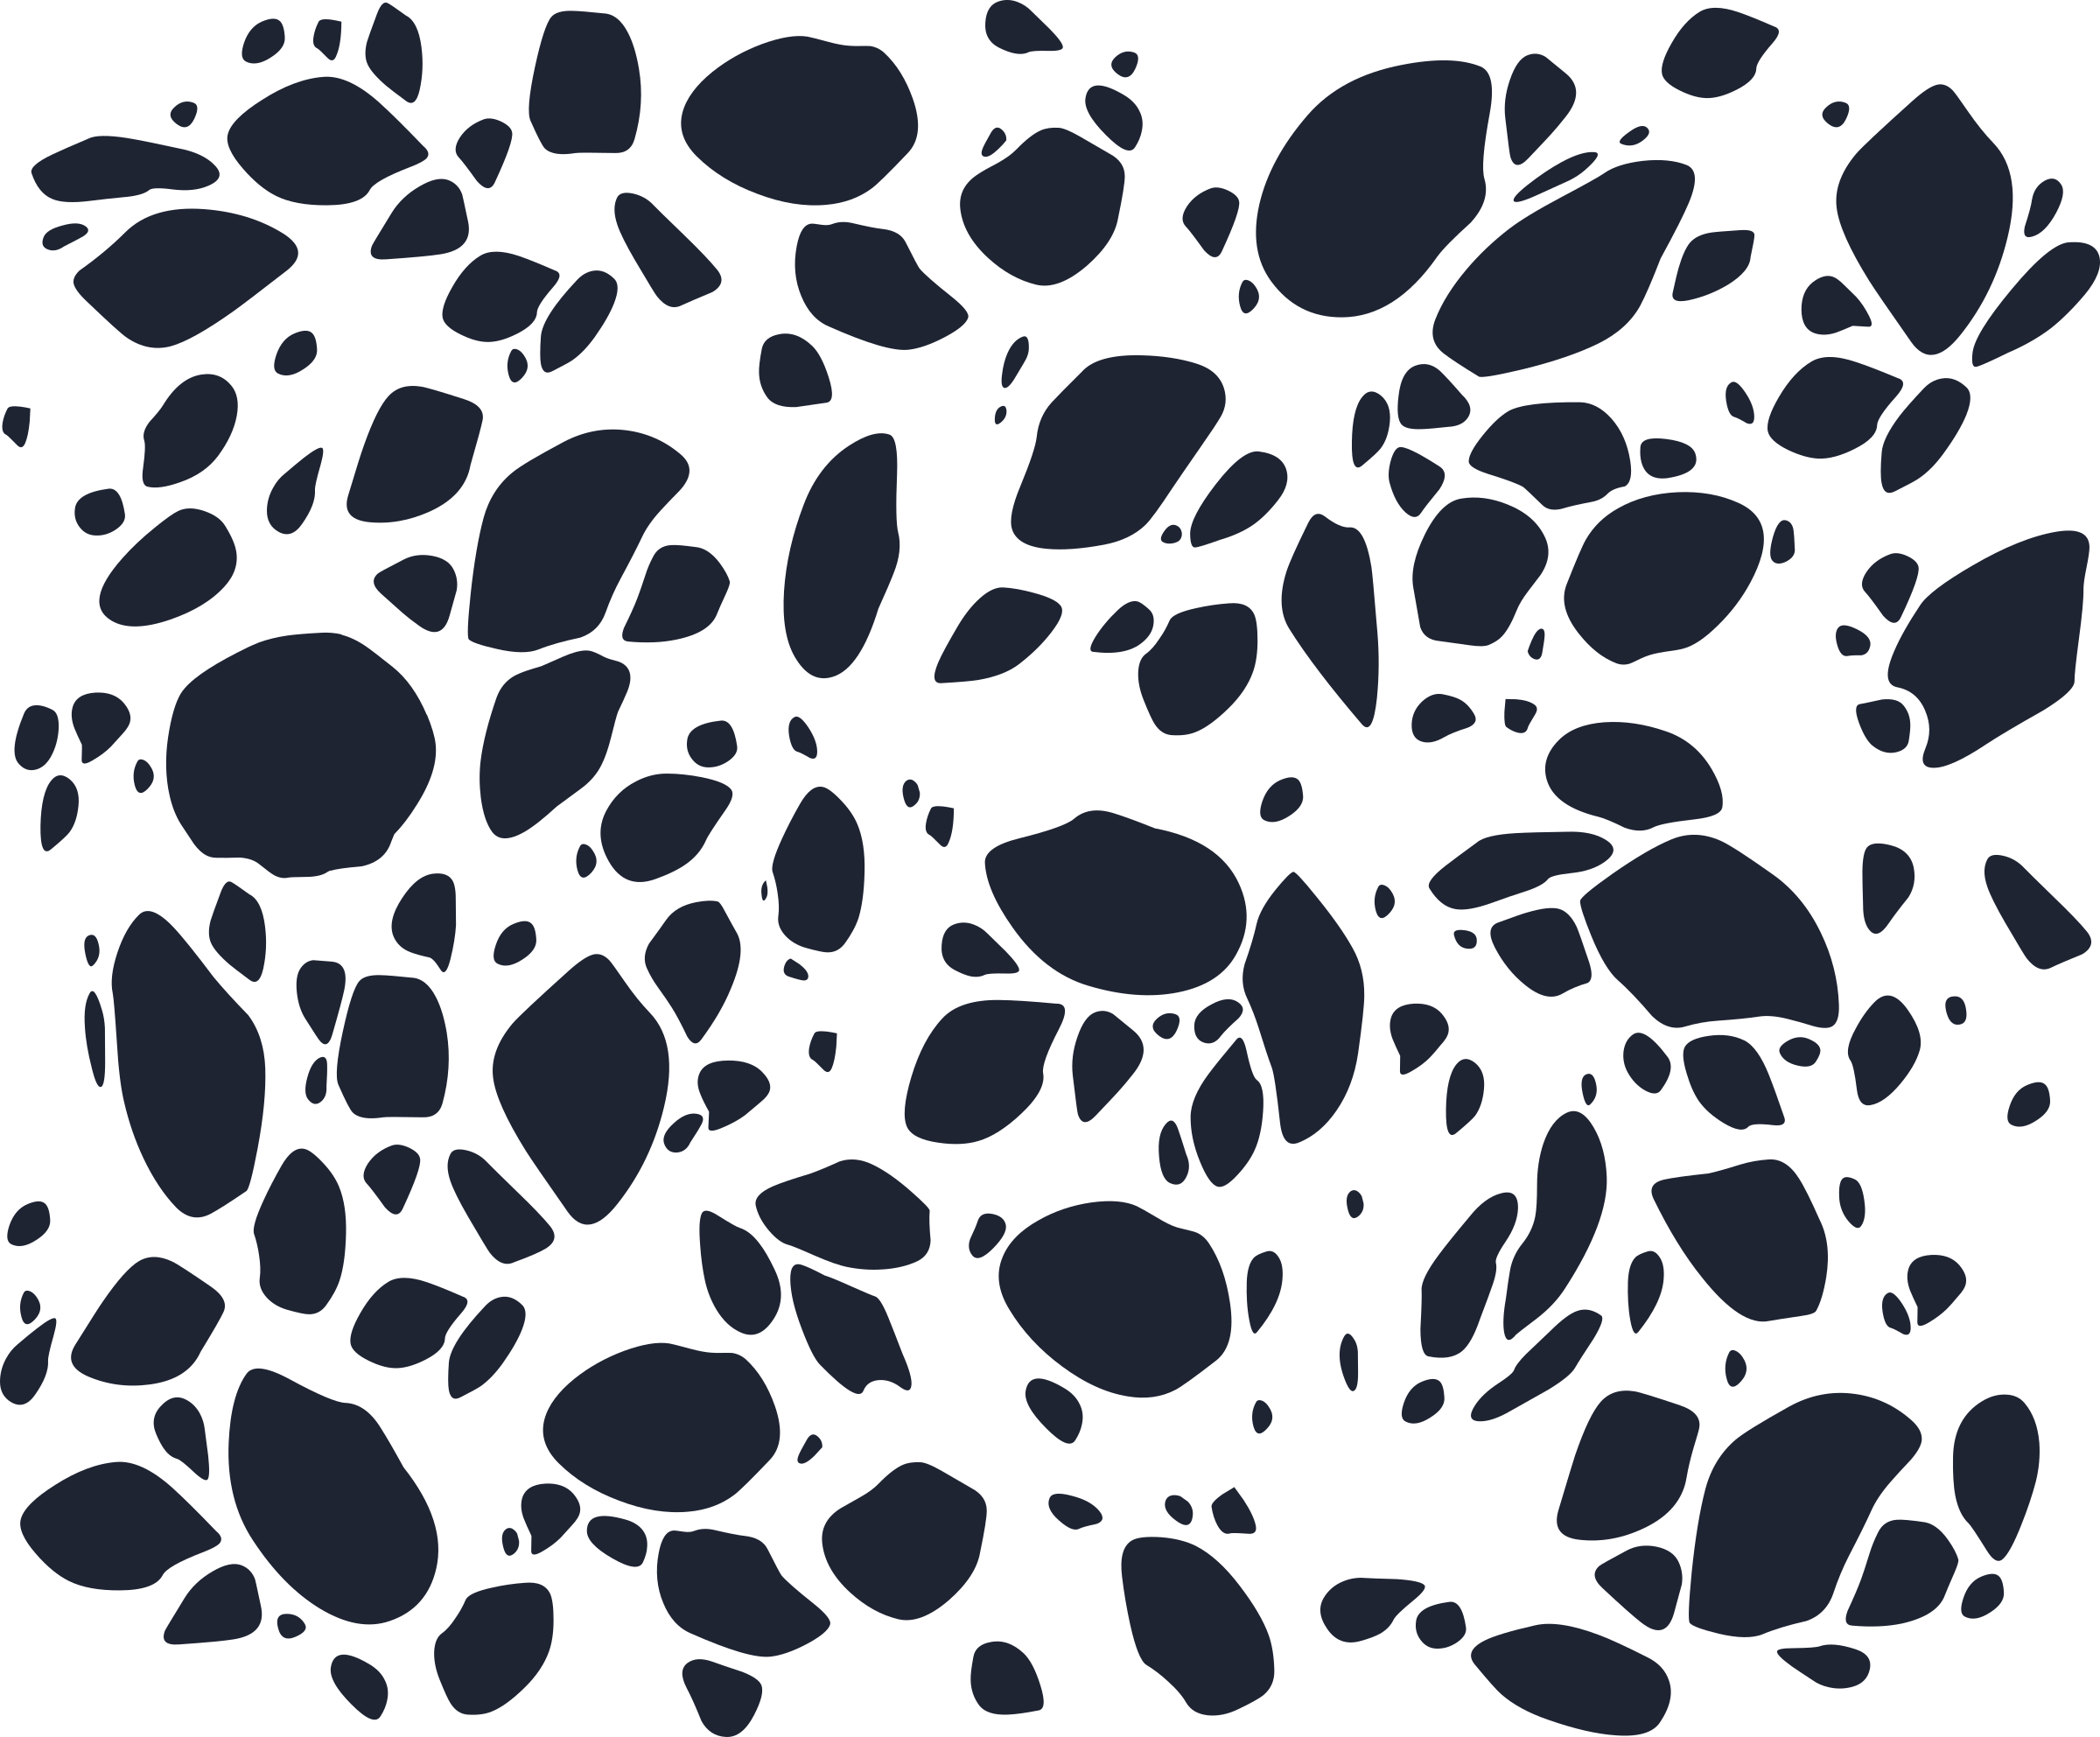 Ilmenskie cave gr stone. Flowers clipart texture